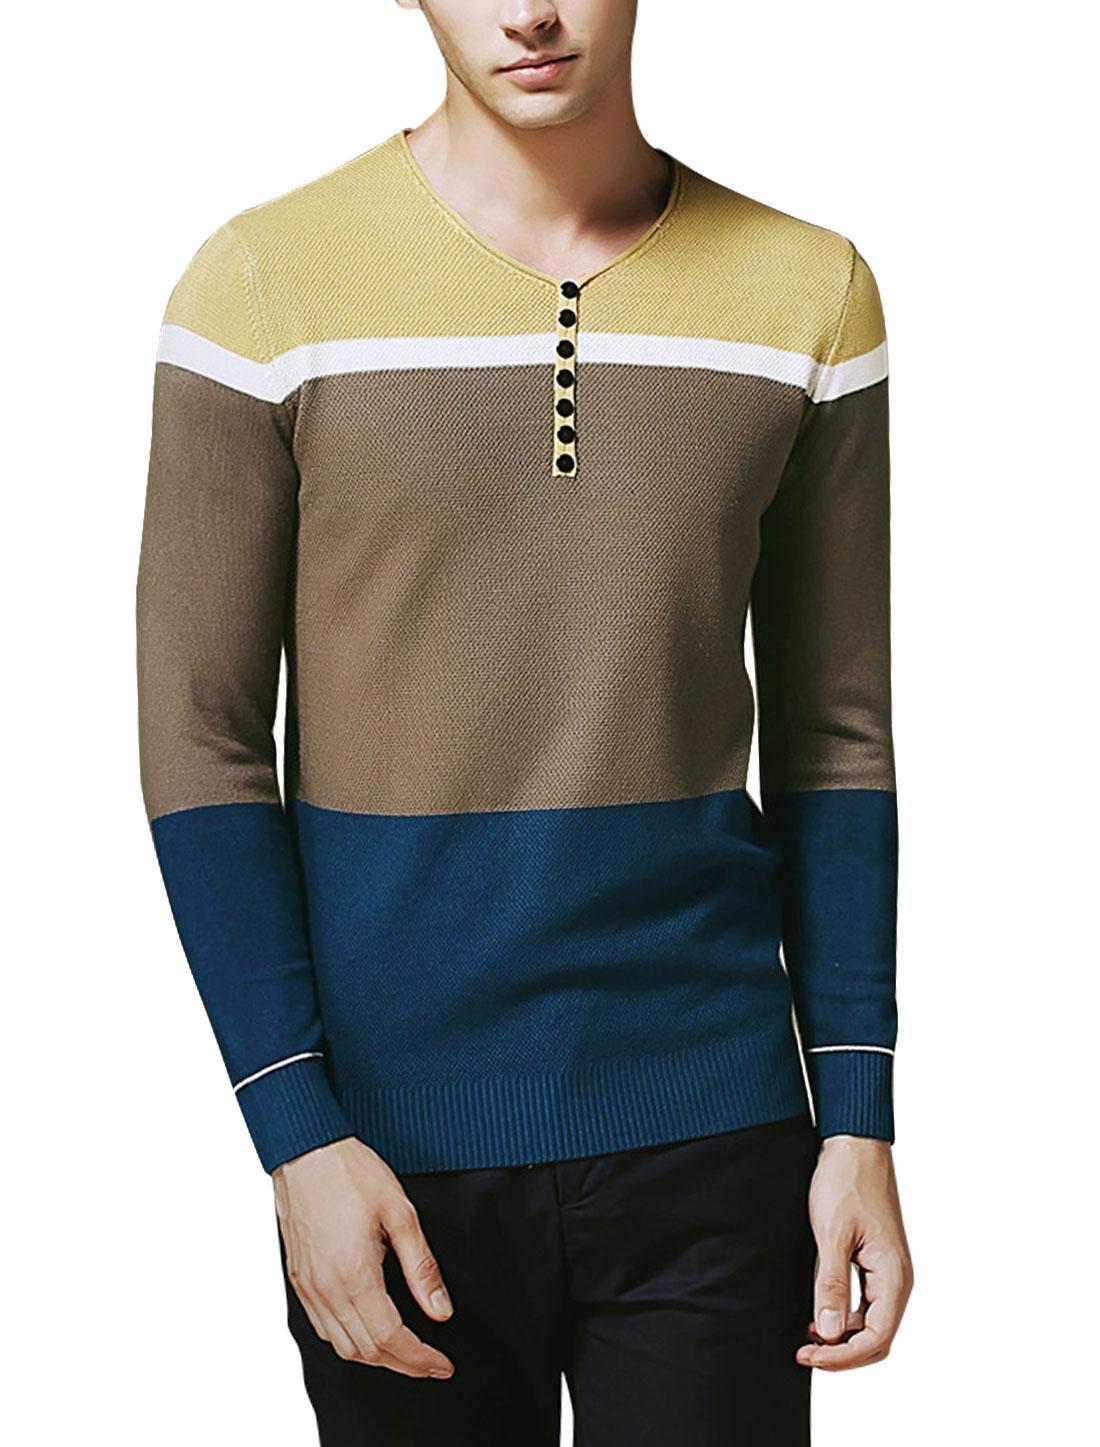 Men Contrast Color Pullover Slim Fit Knit Shirt Navy Blue Brown M